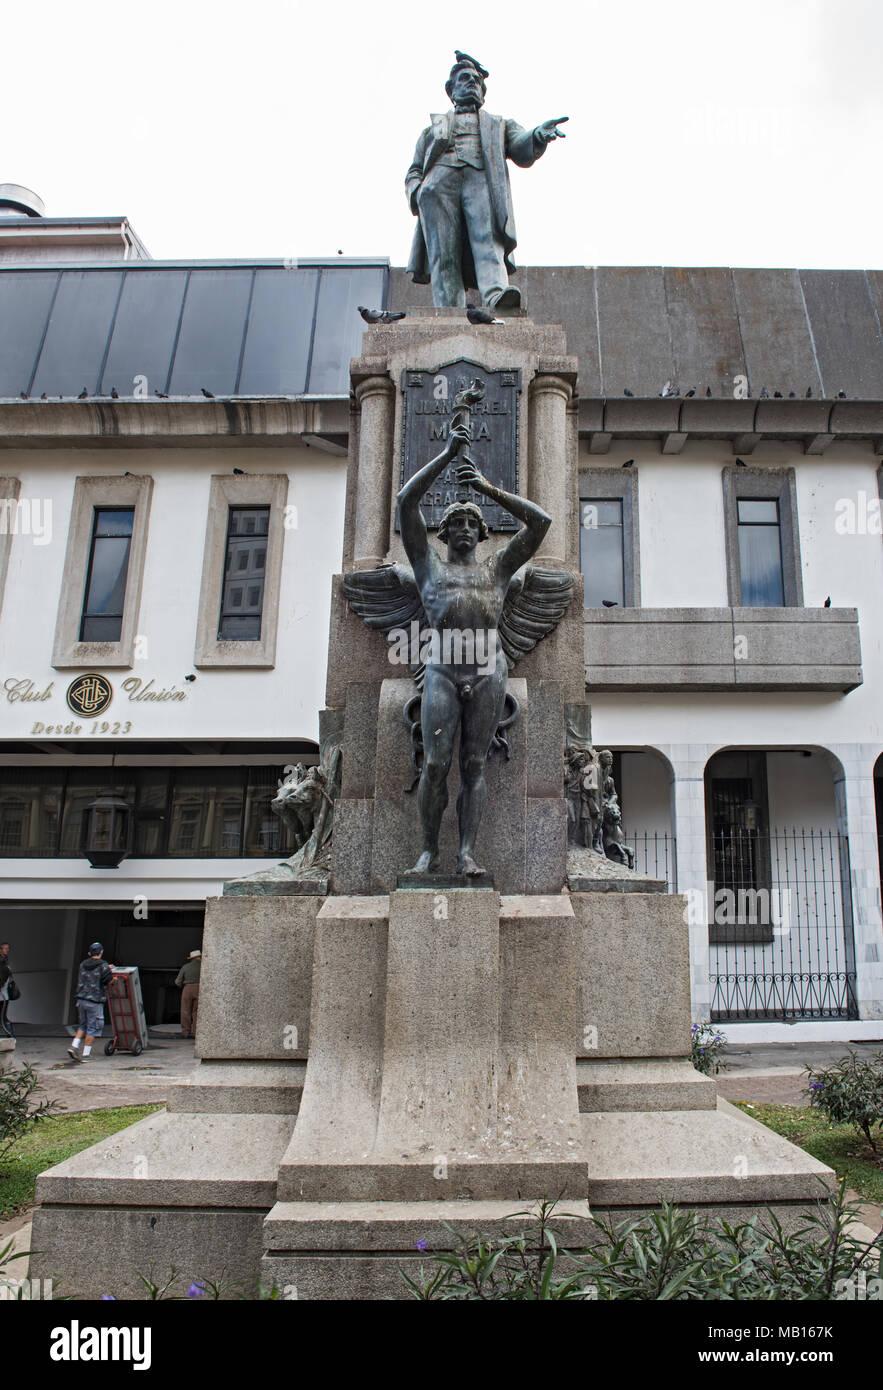 La estatua del ex Presidente de la Post Juan Rafael Mora Porras, San José, Costa Rica Imagen De Stock